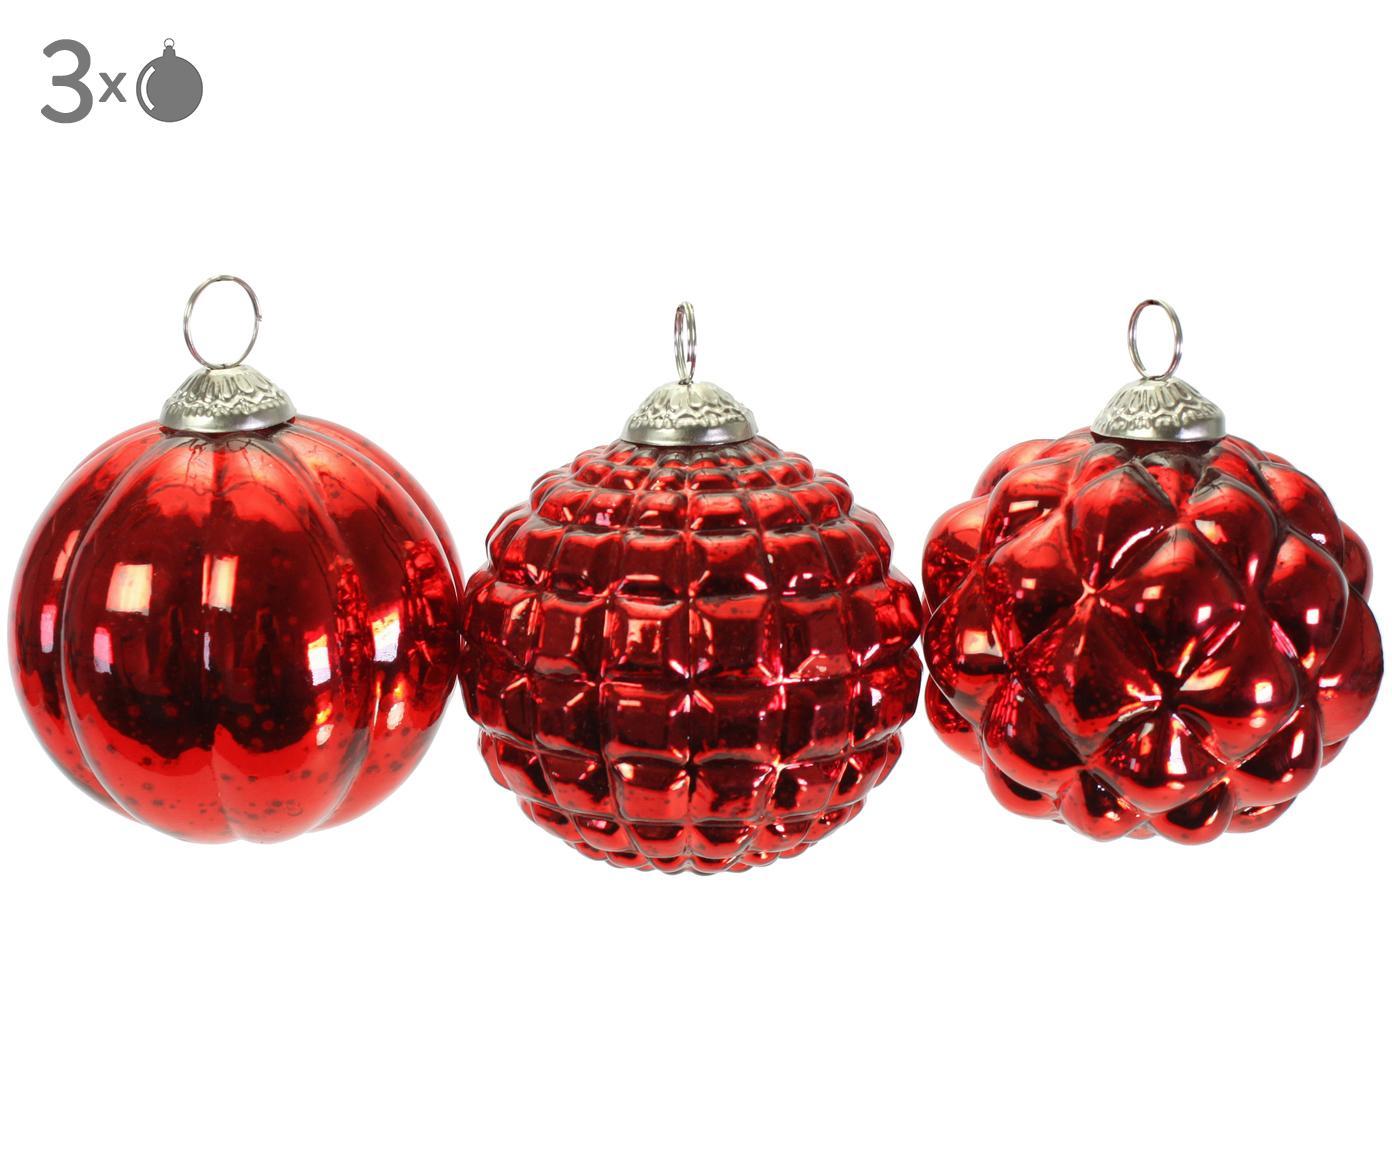 Set palline di Natale Red Variety, 3 pz., Vetro verniciato, Rosso, Ø 10 cm